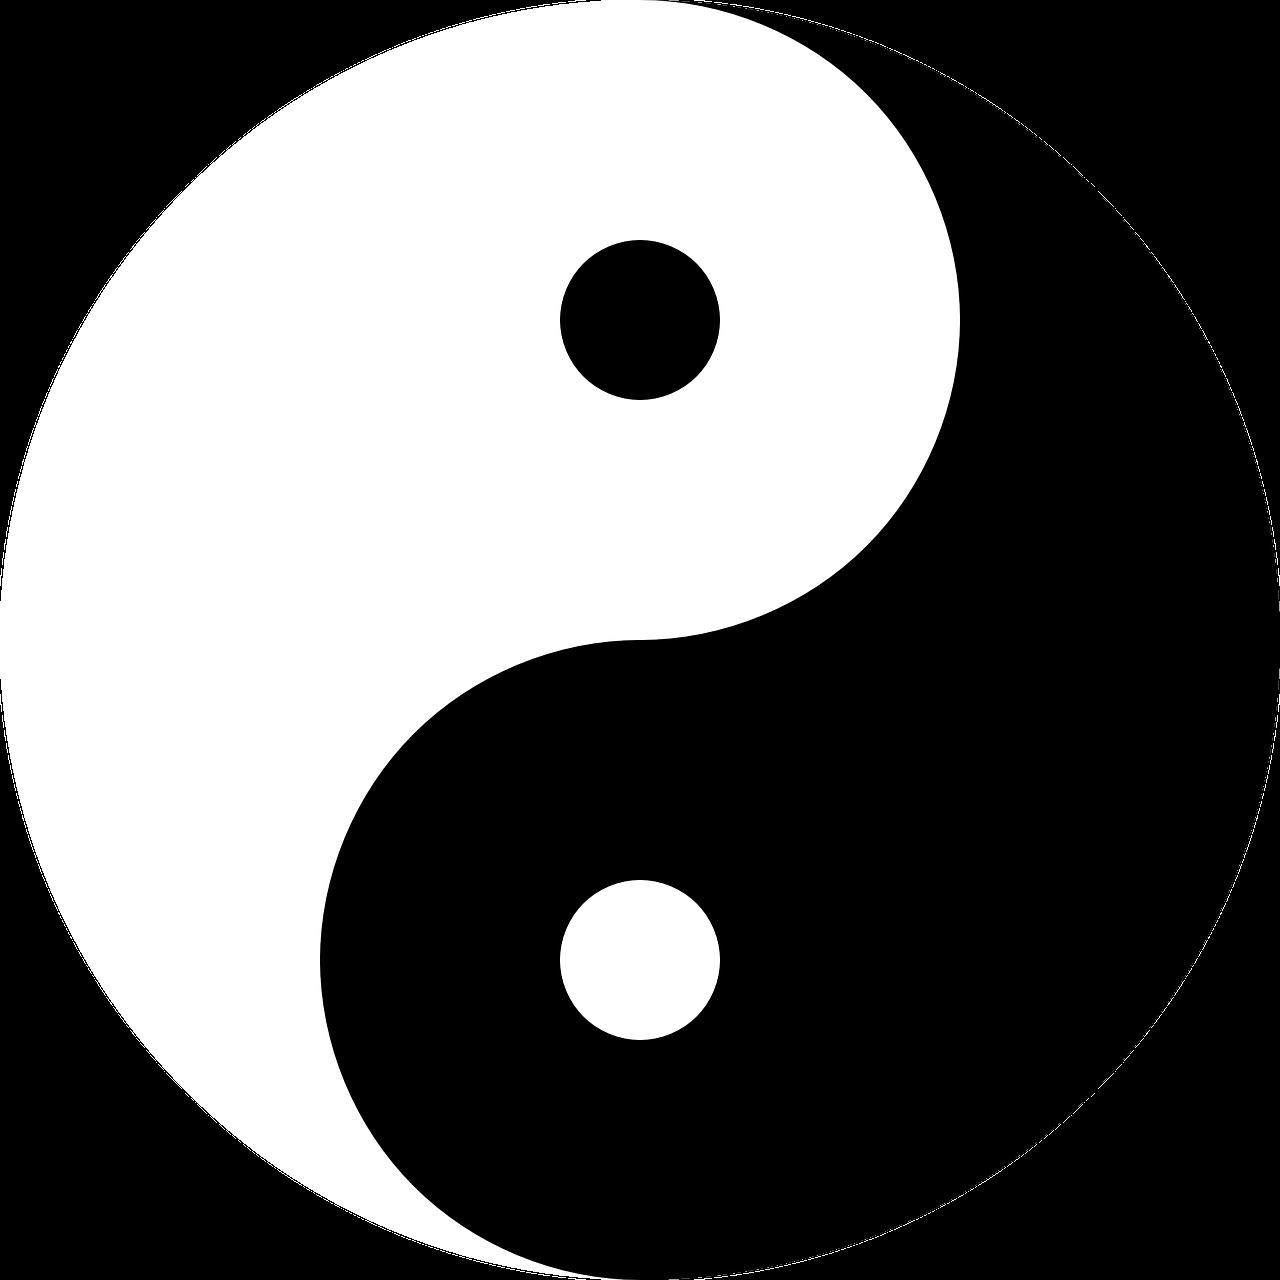 yin and yang, harmony, black